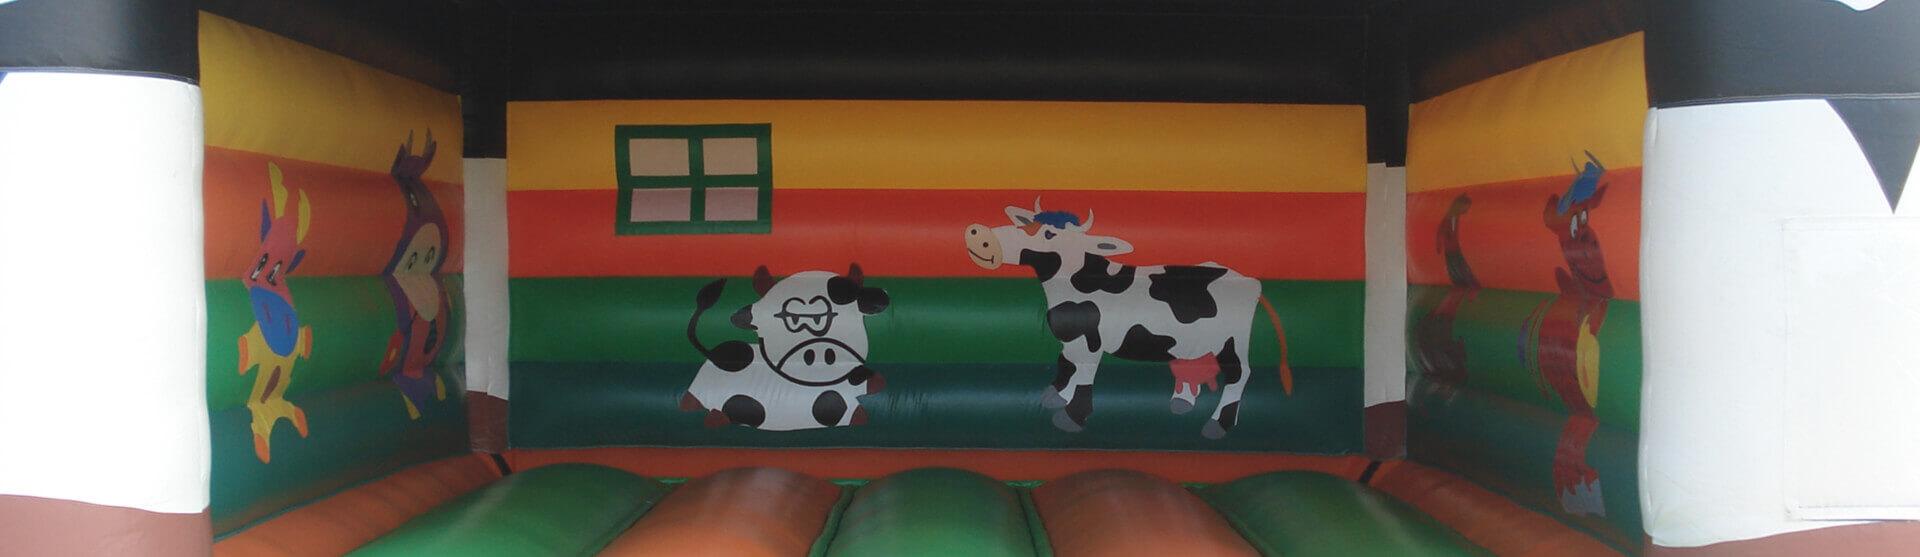 koeienkade-banner-springkussen